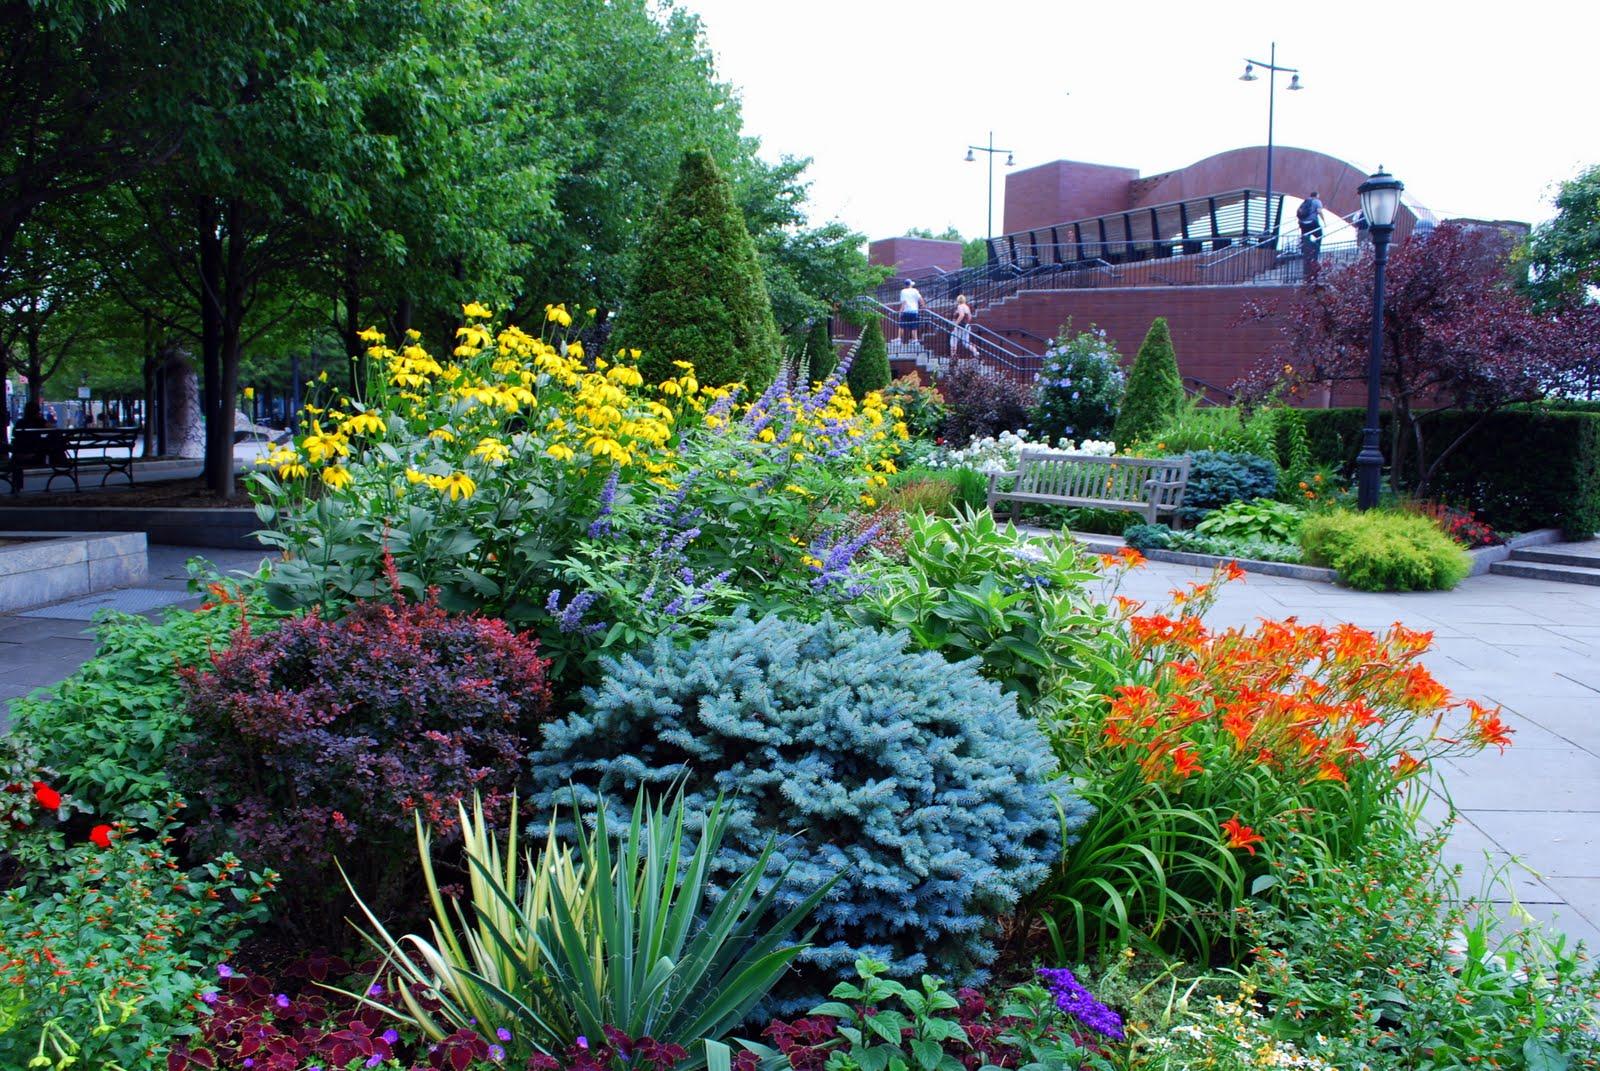 Mille Fiori Favoriti Green Gardening In Wagner Park